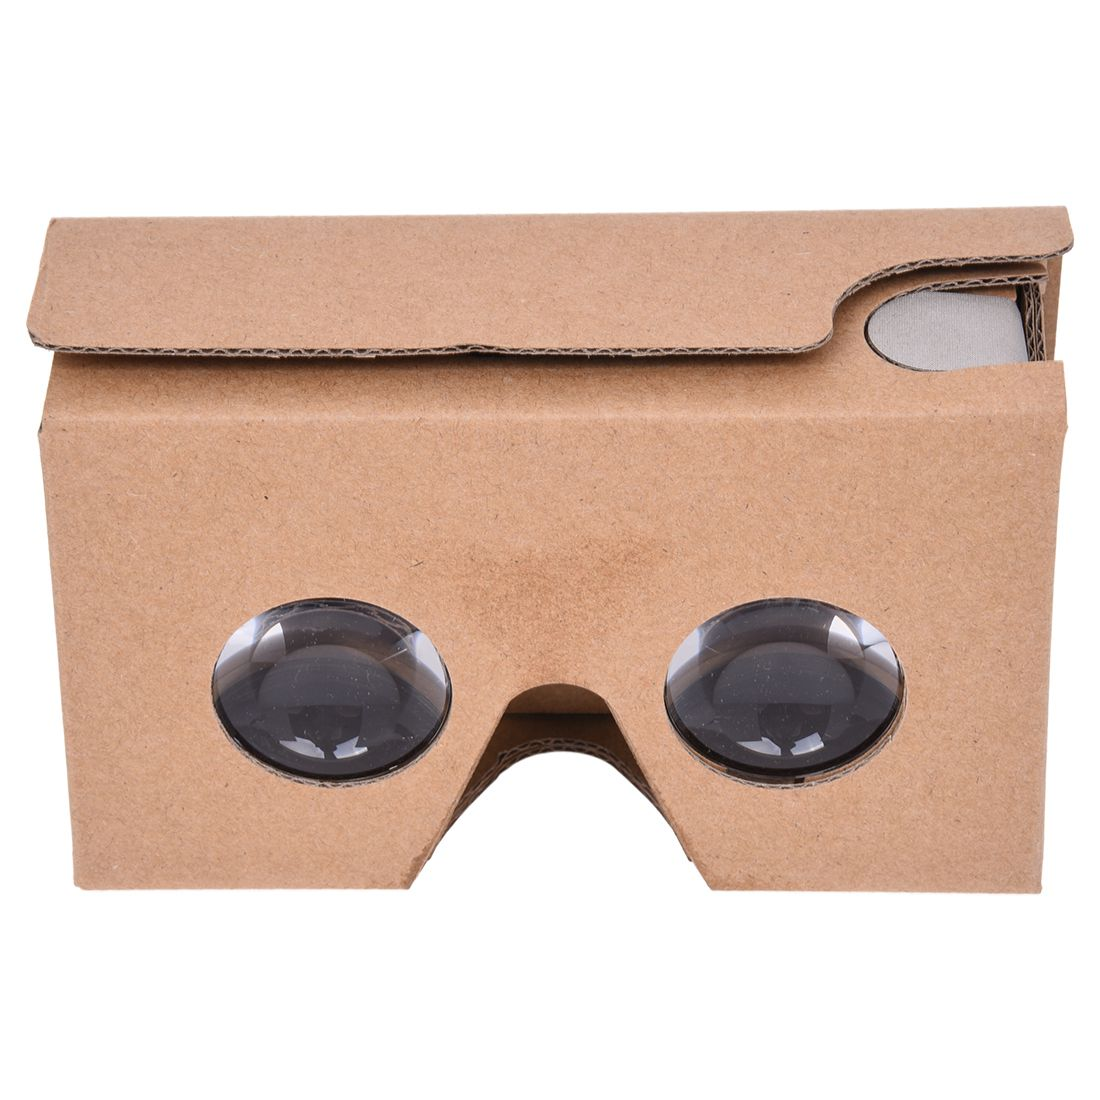 SCLS For Google Cardboard V2 3D Glasses VR Valencia Fit 6Inch Smartphone+Headband